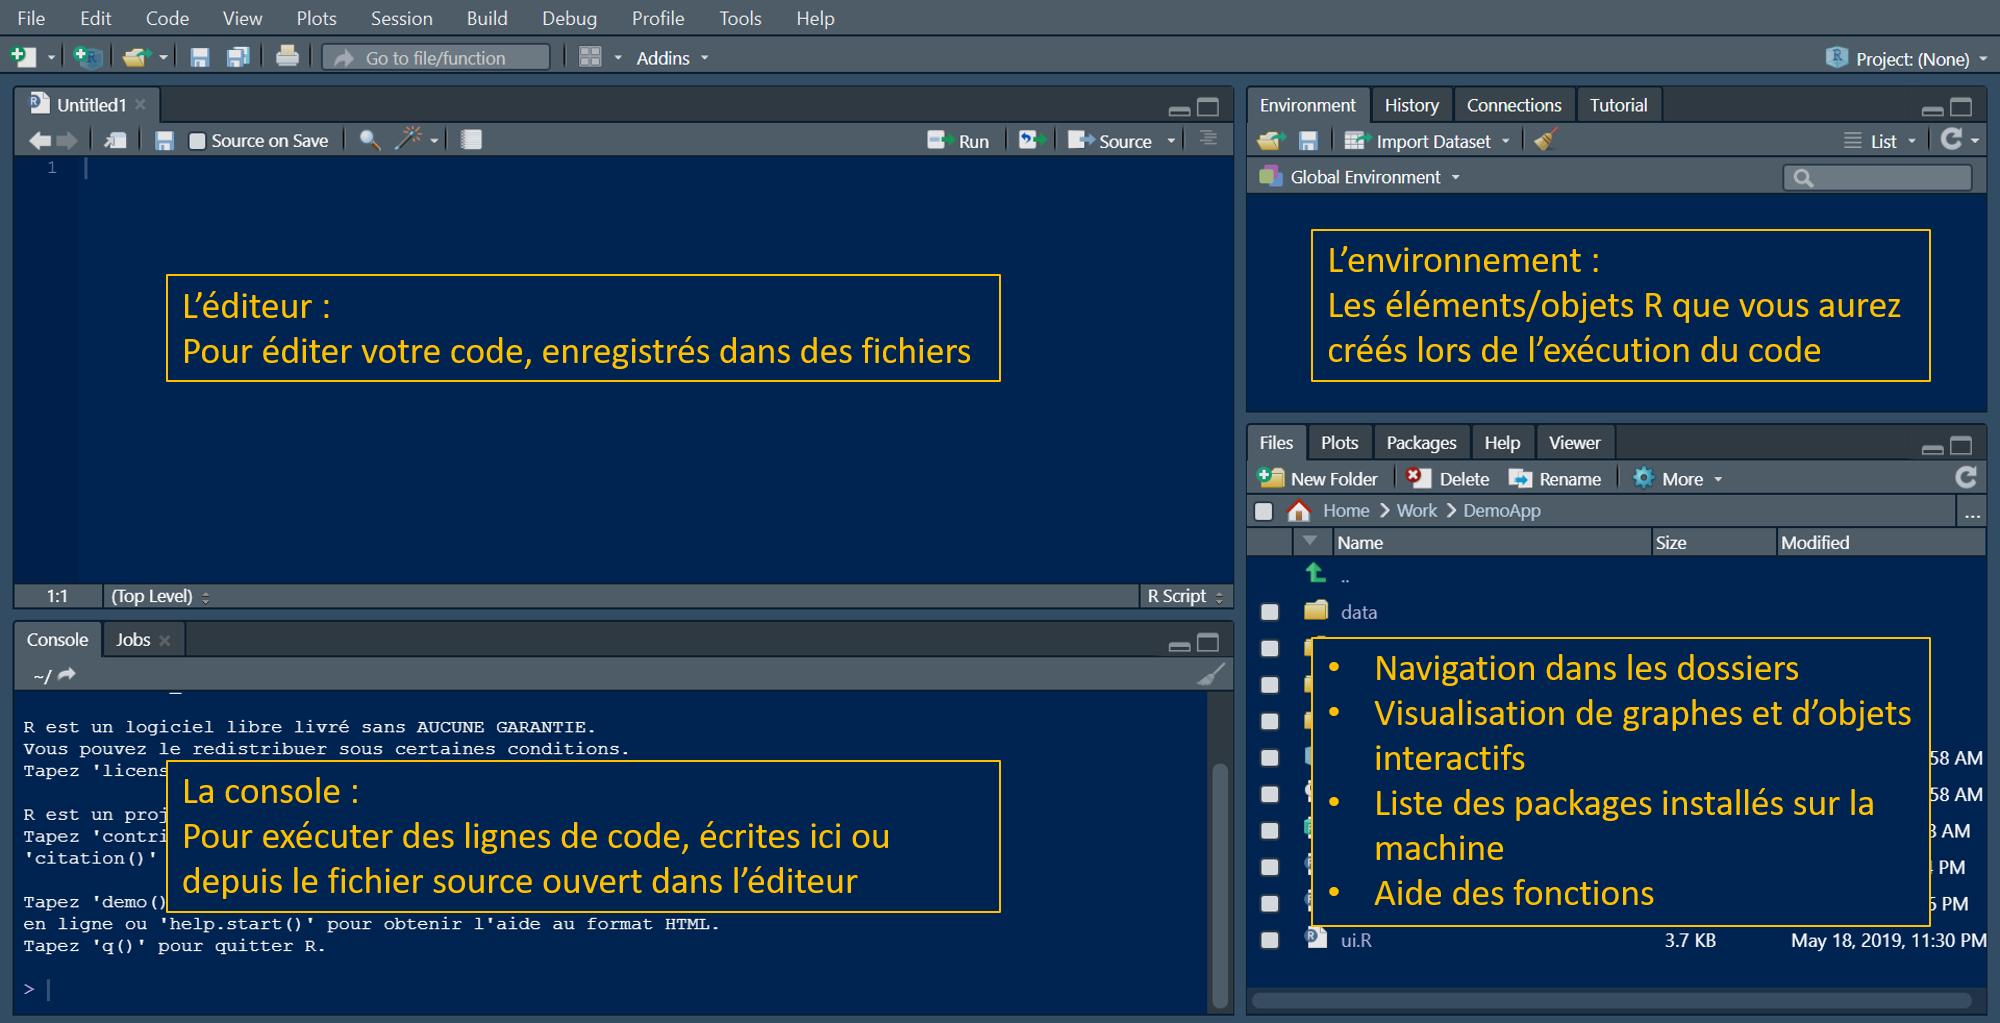 Présentation interface RStudio